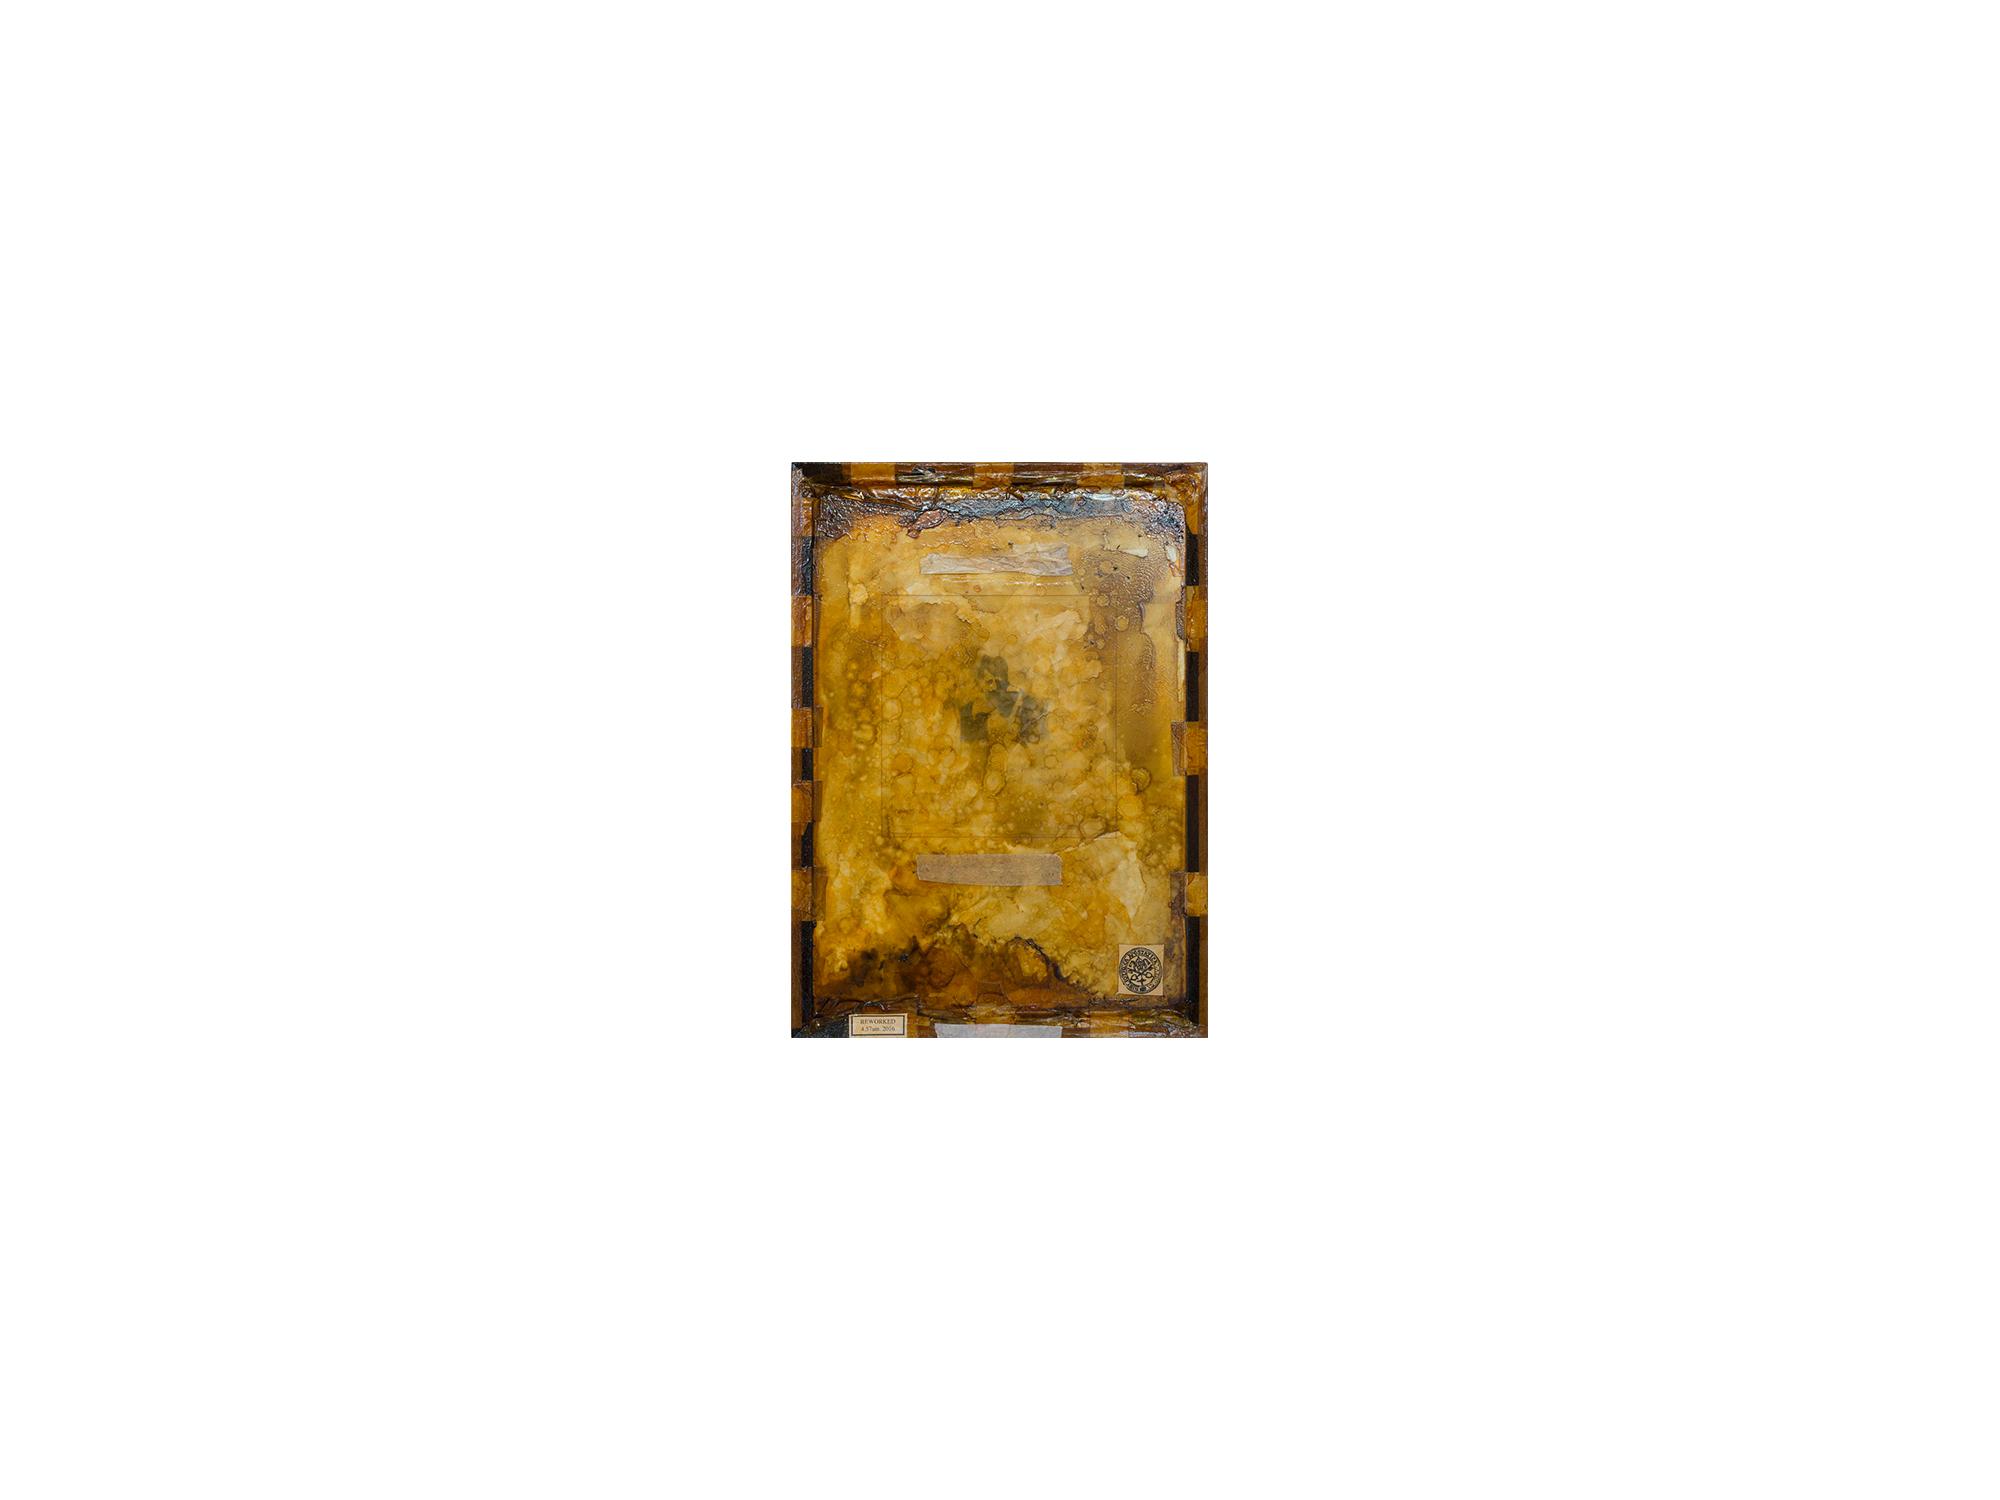 Bernard Sachs   Perpetual Motion (Portrait of Heinrich Anton Muller) , 2016 mixed media on framed paper 65 x 44cm   ARTIST BIO